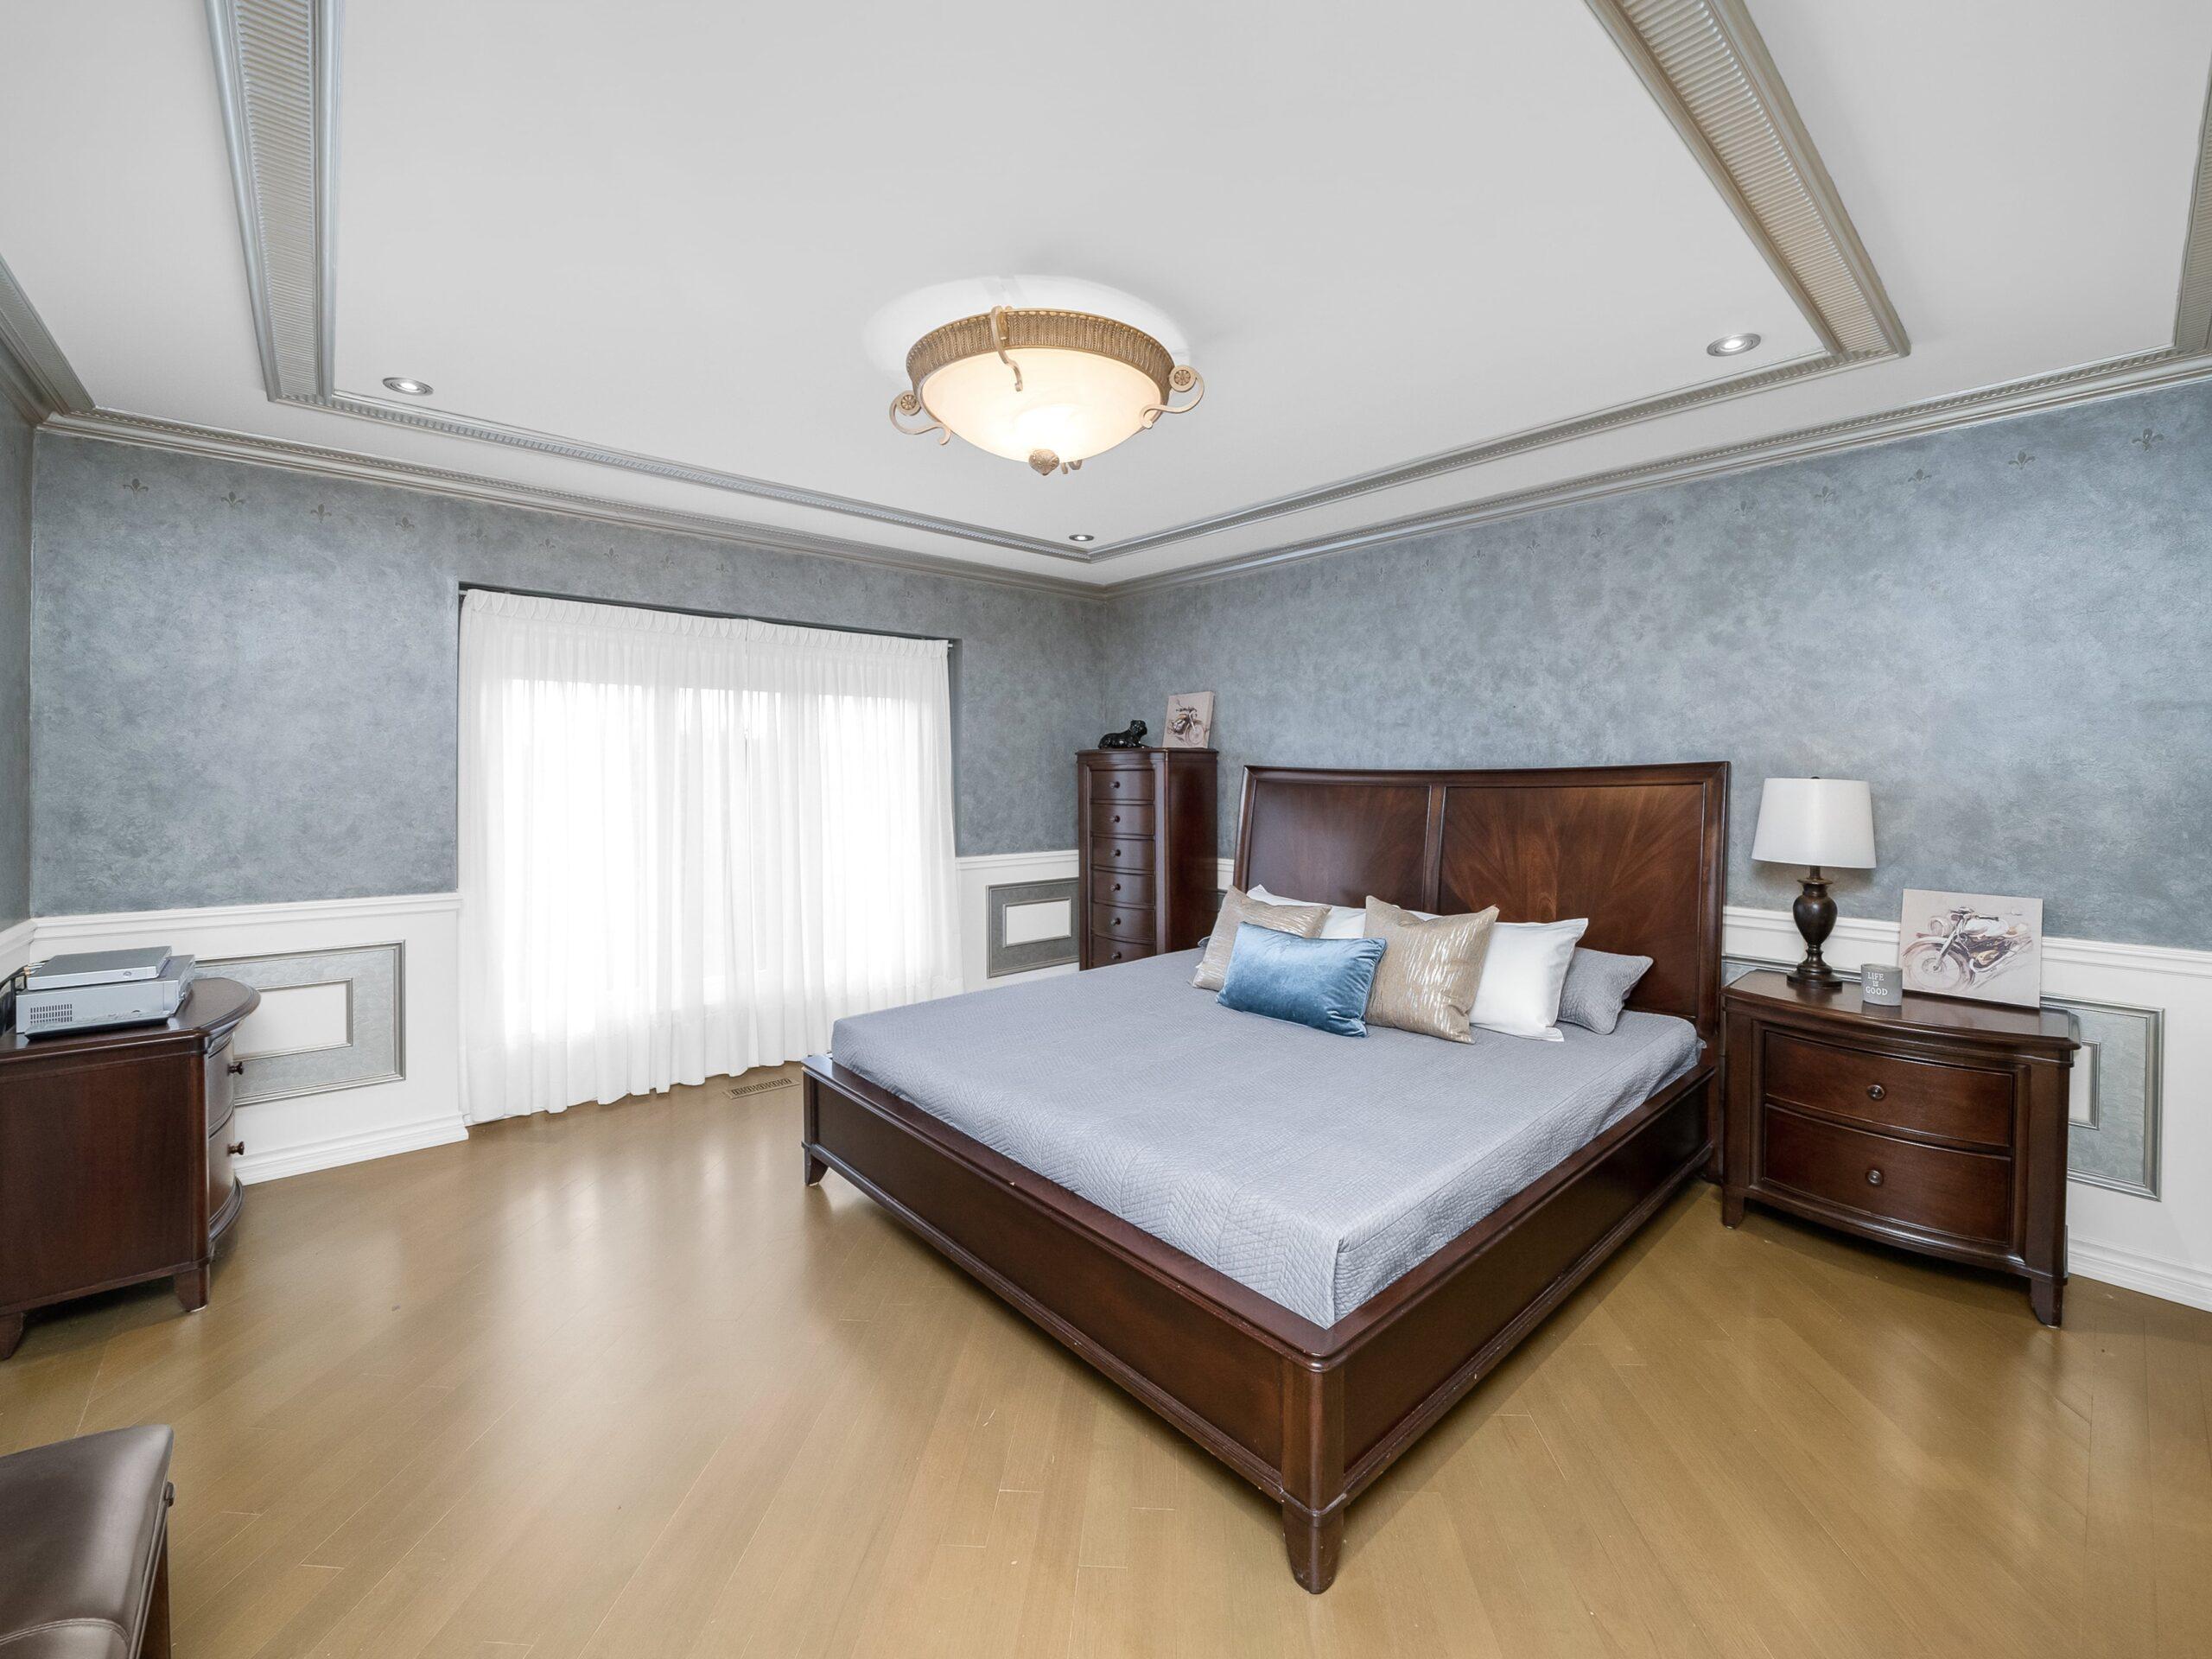 046-Bedroom-4200x3151-min